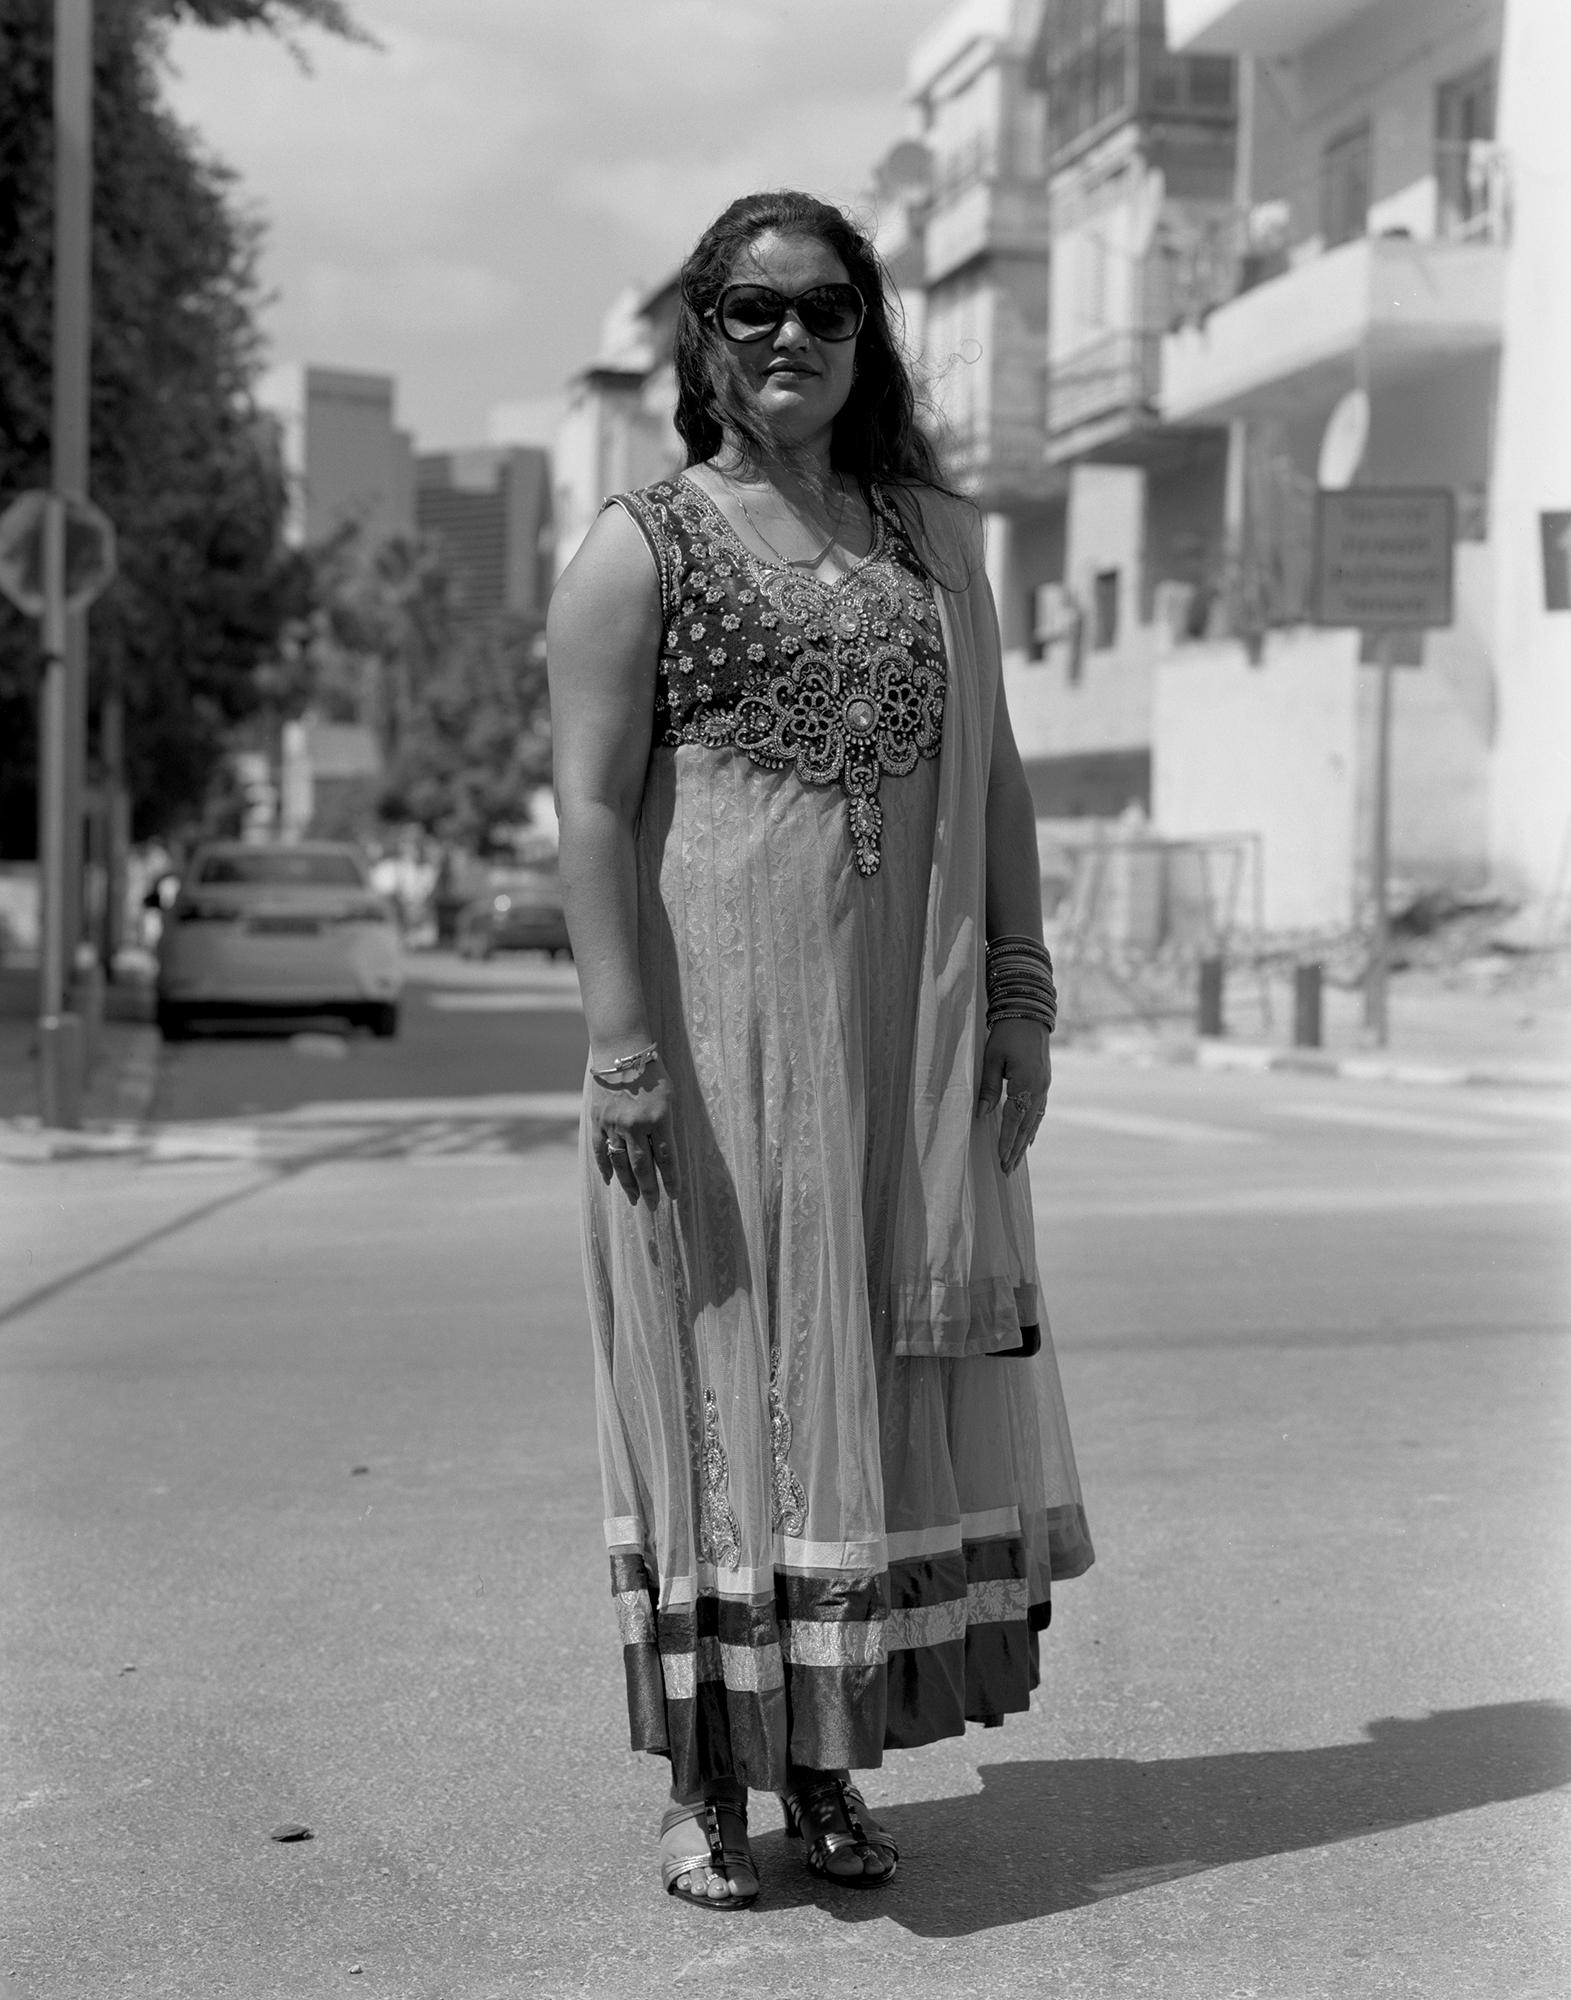 Woman (Nepal) Neve Sha'anan 2016